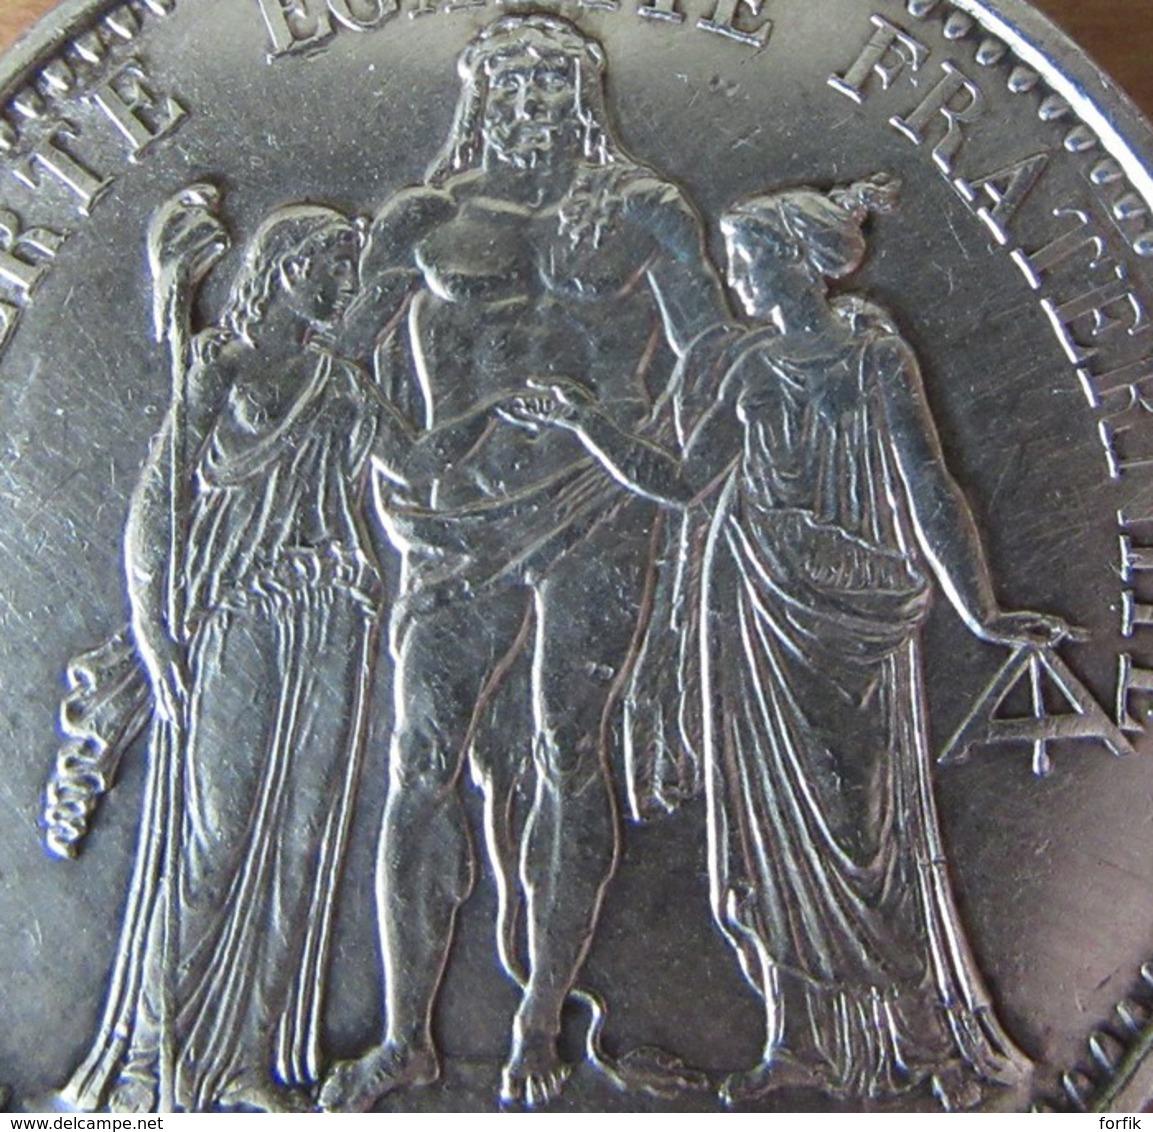 France - Monnaie 10 Francs 1965 En Argent - SUP - K. 10 Francs